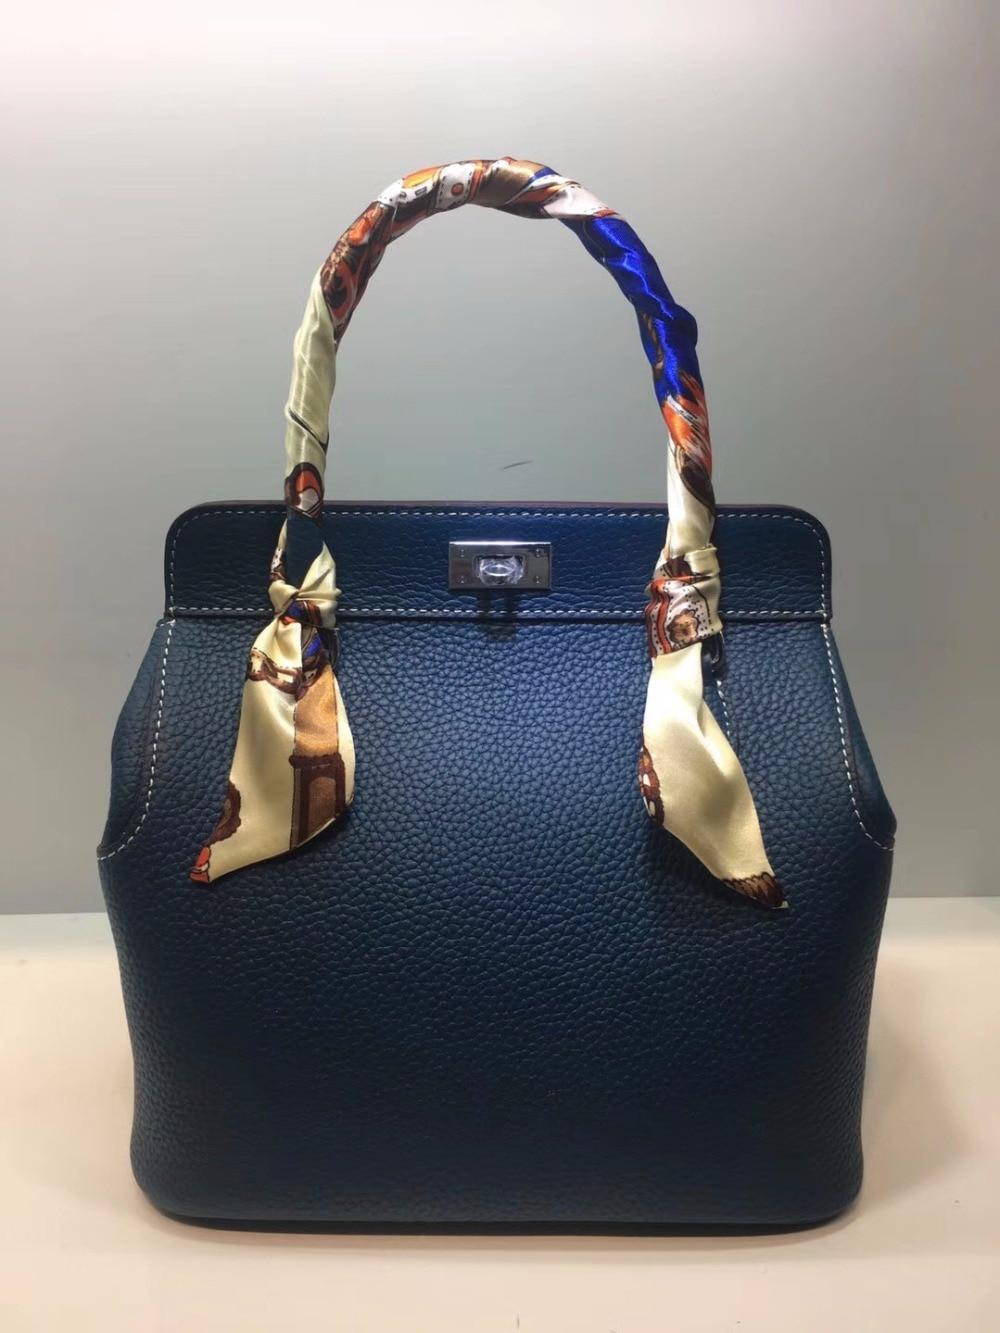 Kafunila 2018 women genuine leather designer brand lock bucket hasp luxury handbags crossbody purse messenger shoulder tote bags цепь champion a043 sg 52e